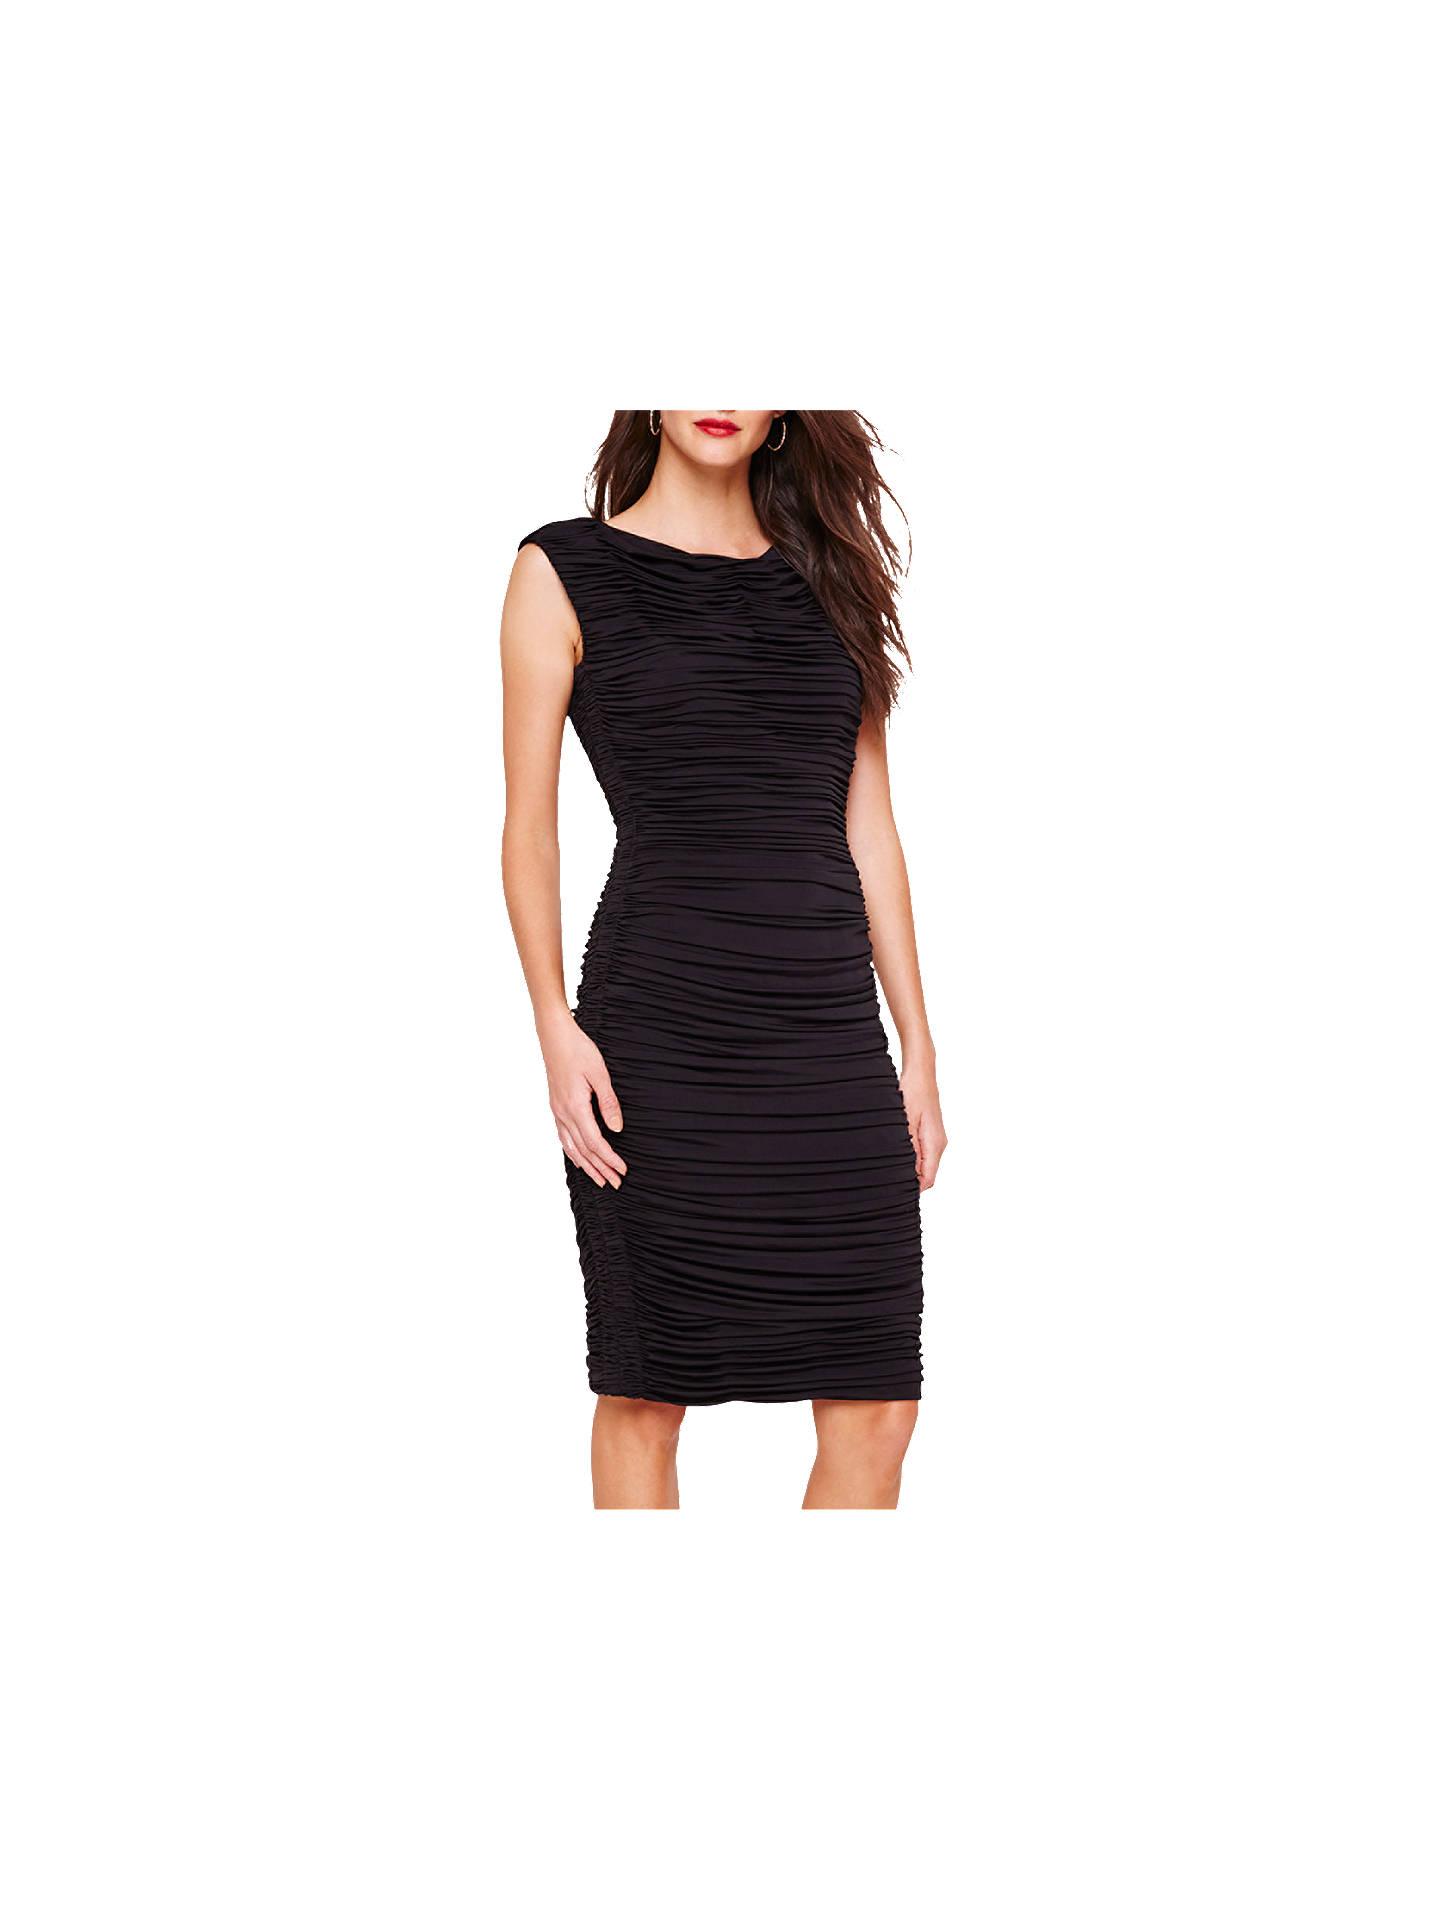 Ruching Dress